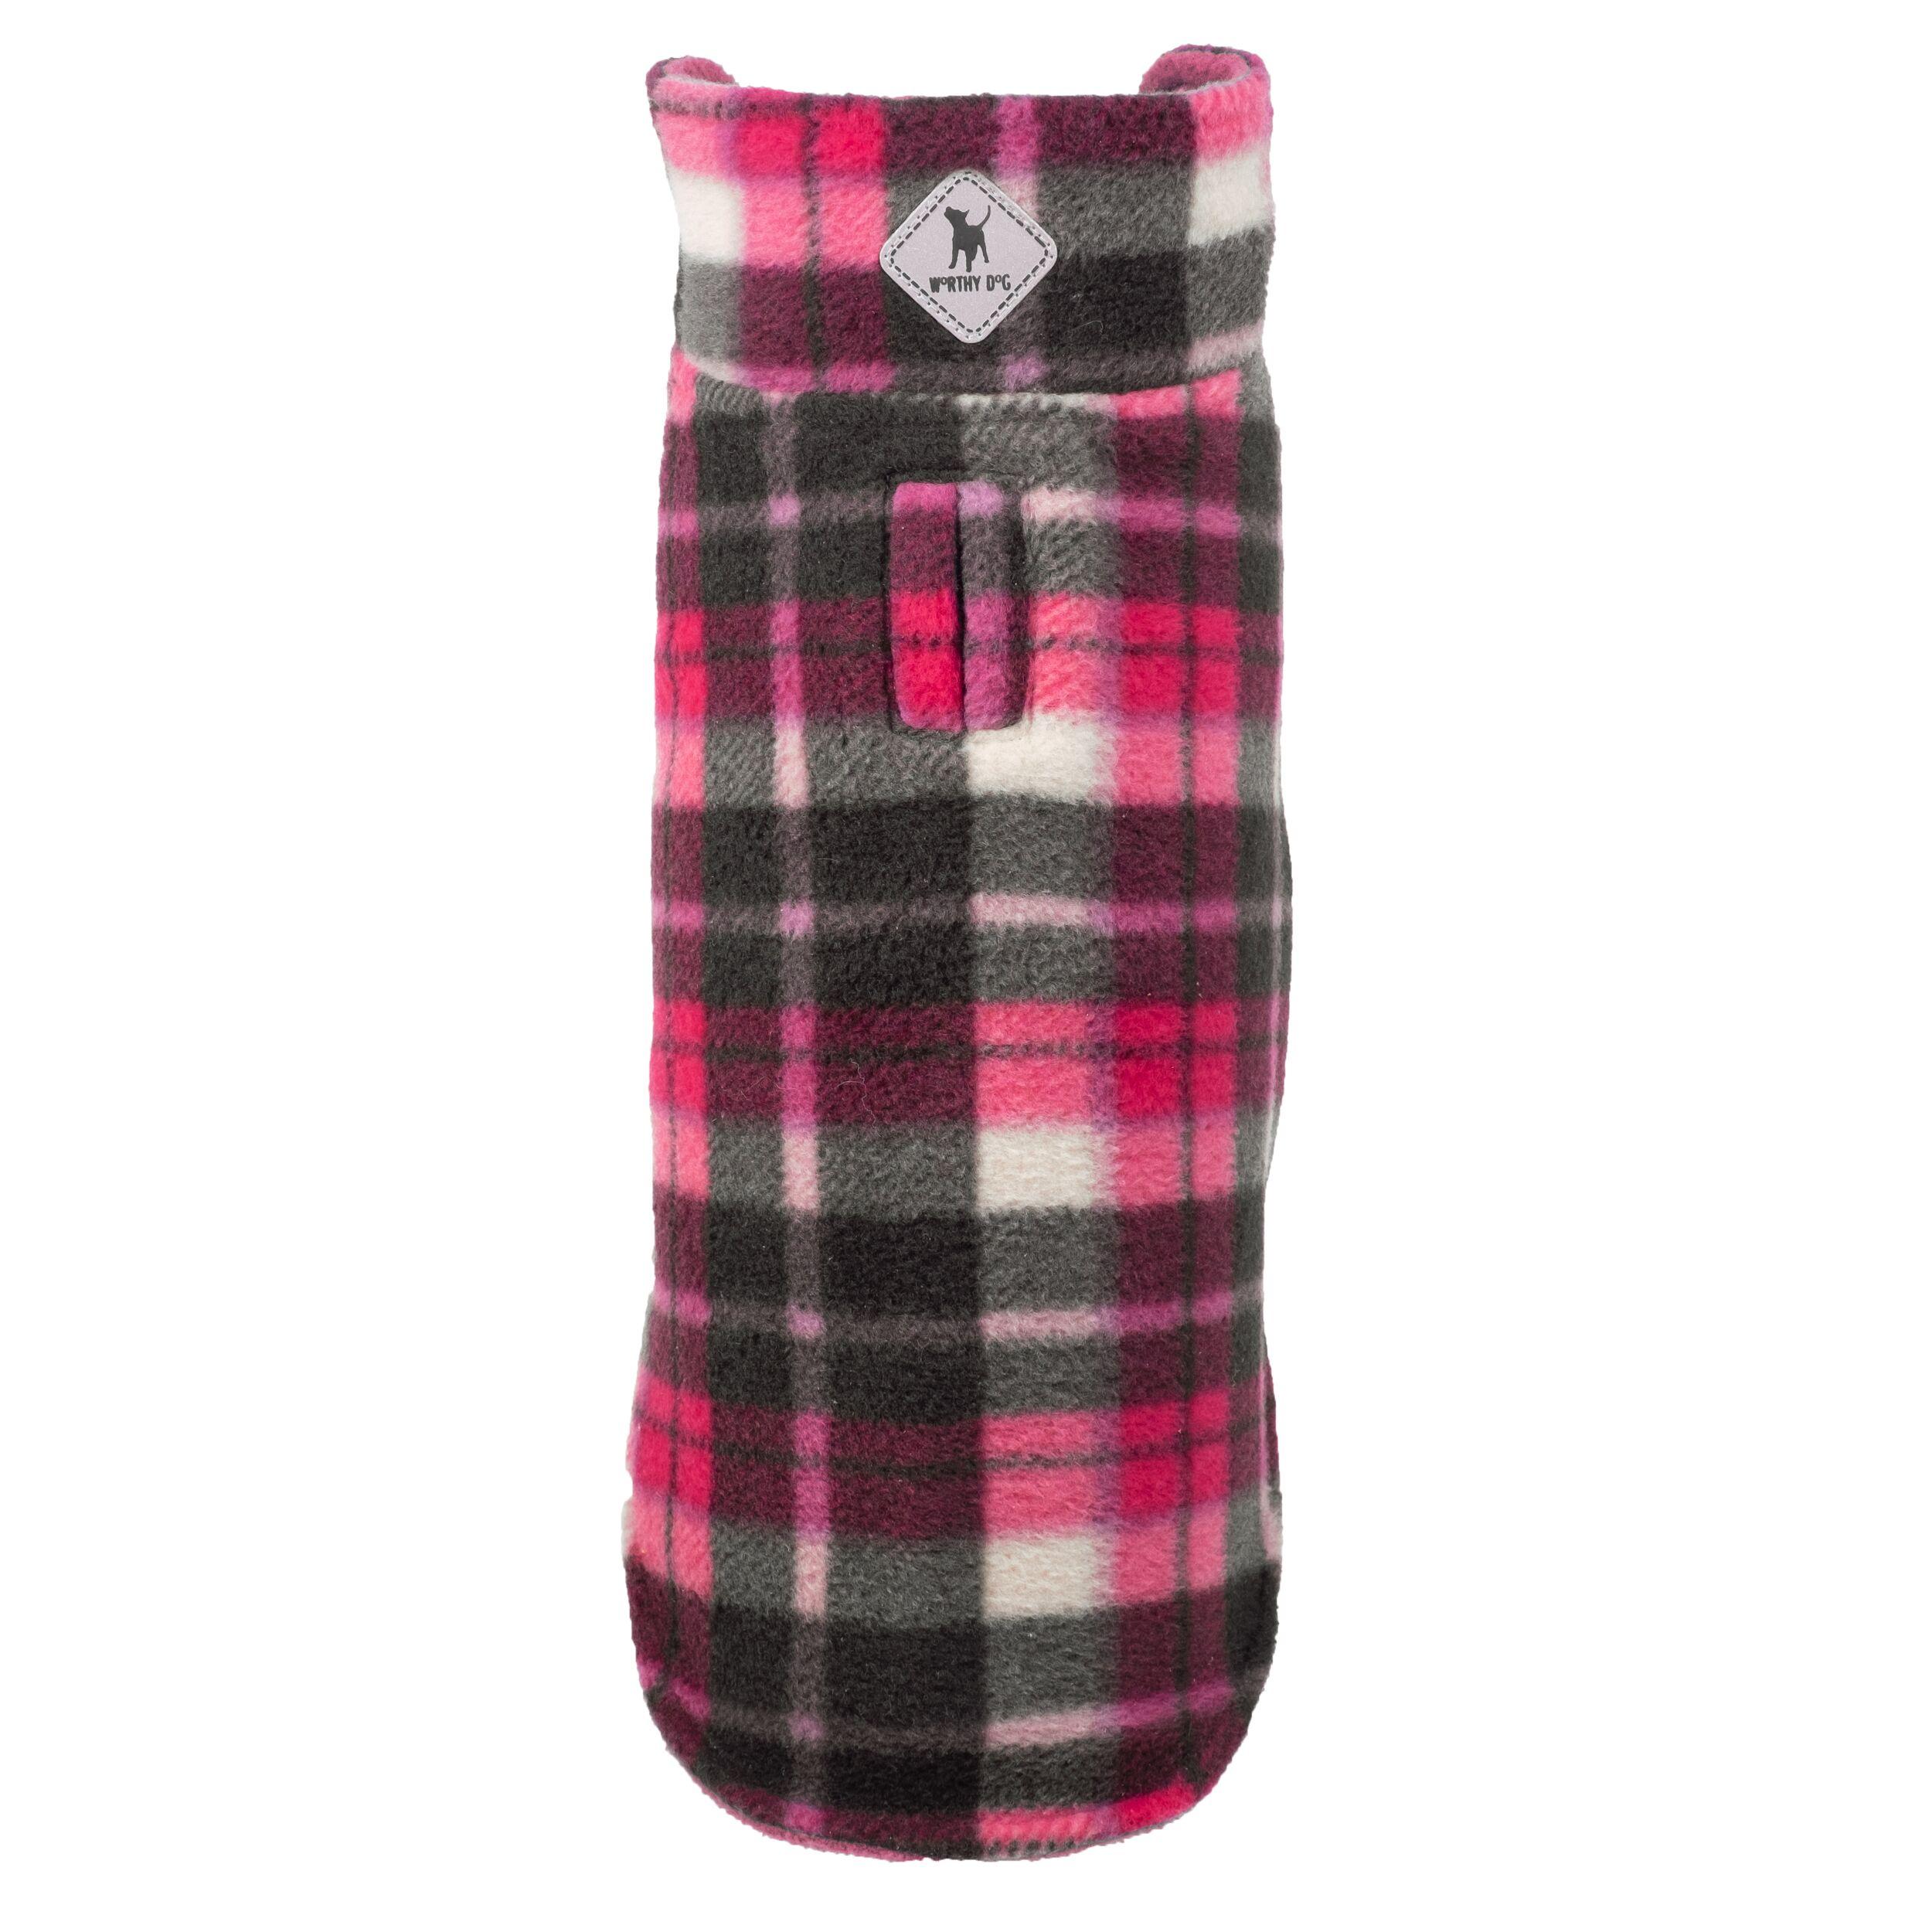 The Worthy Dog Reversible Fargo Fleece Jacket, Pink Plaid, 8-in